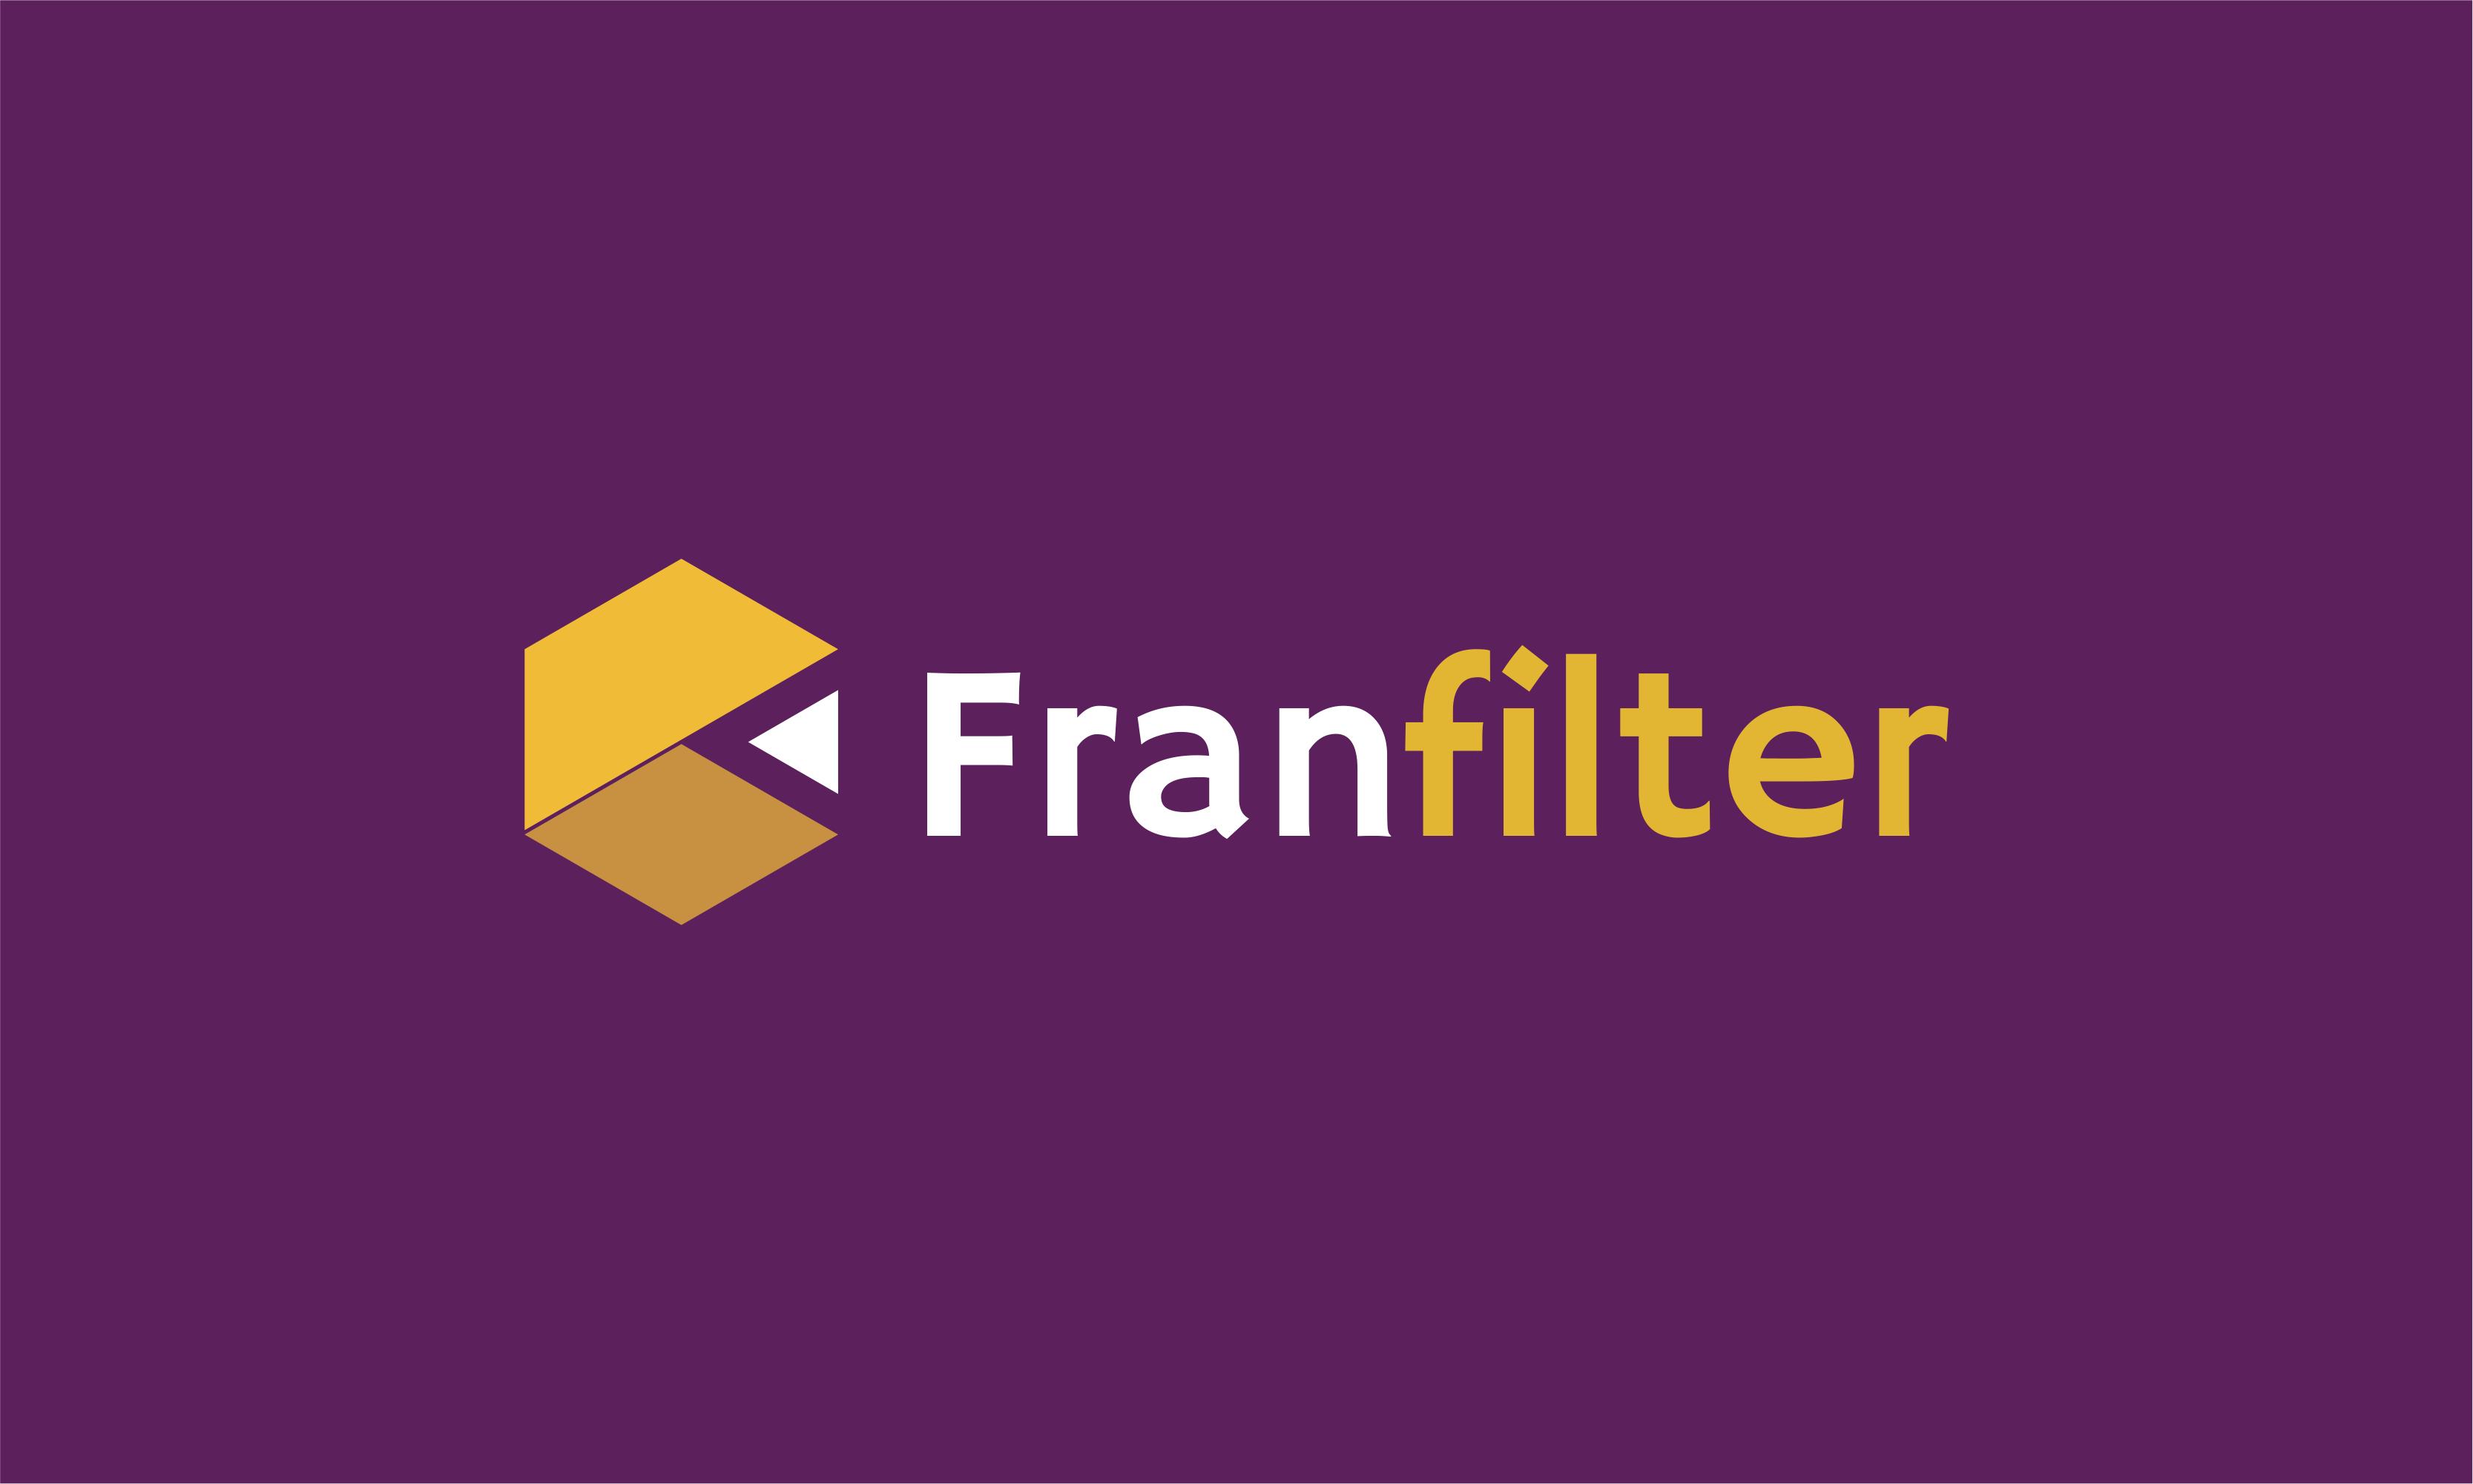 Franfilter